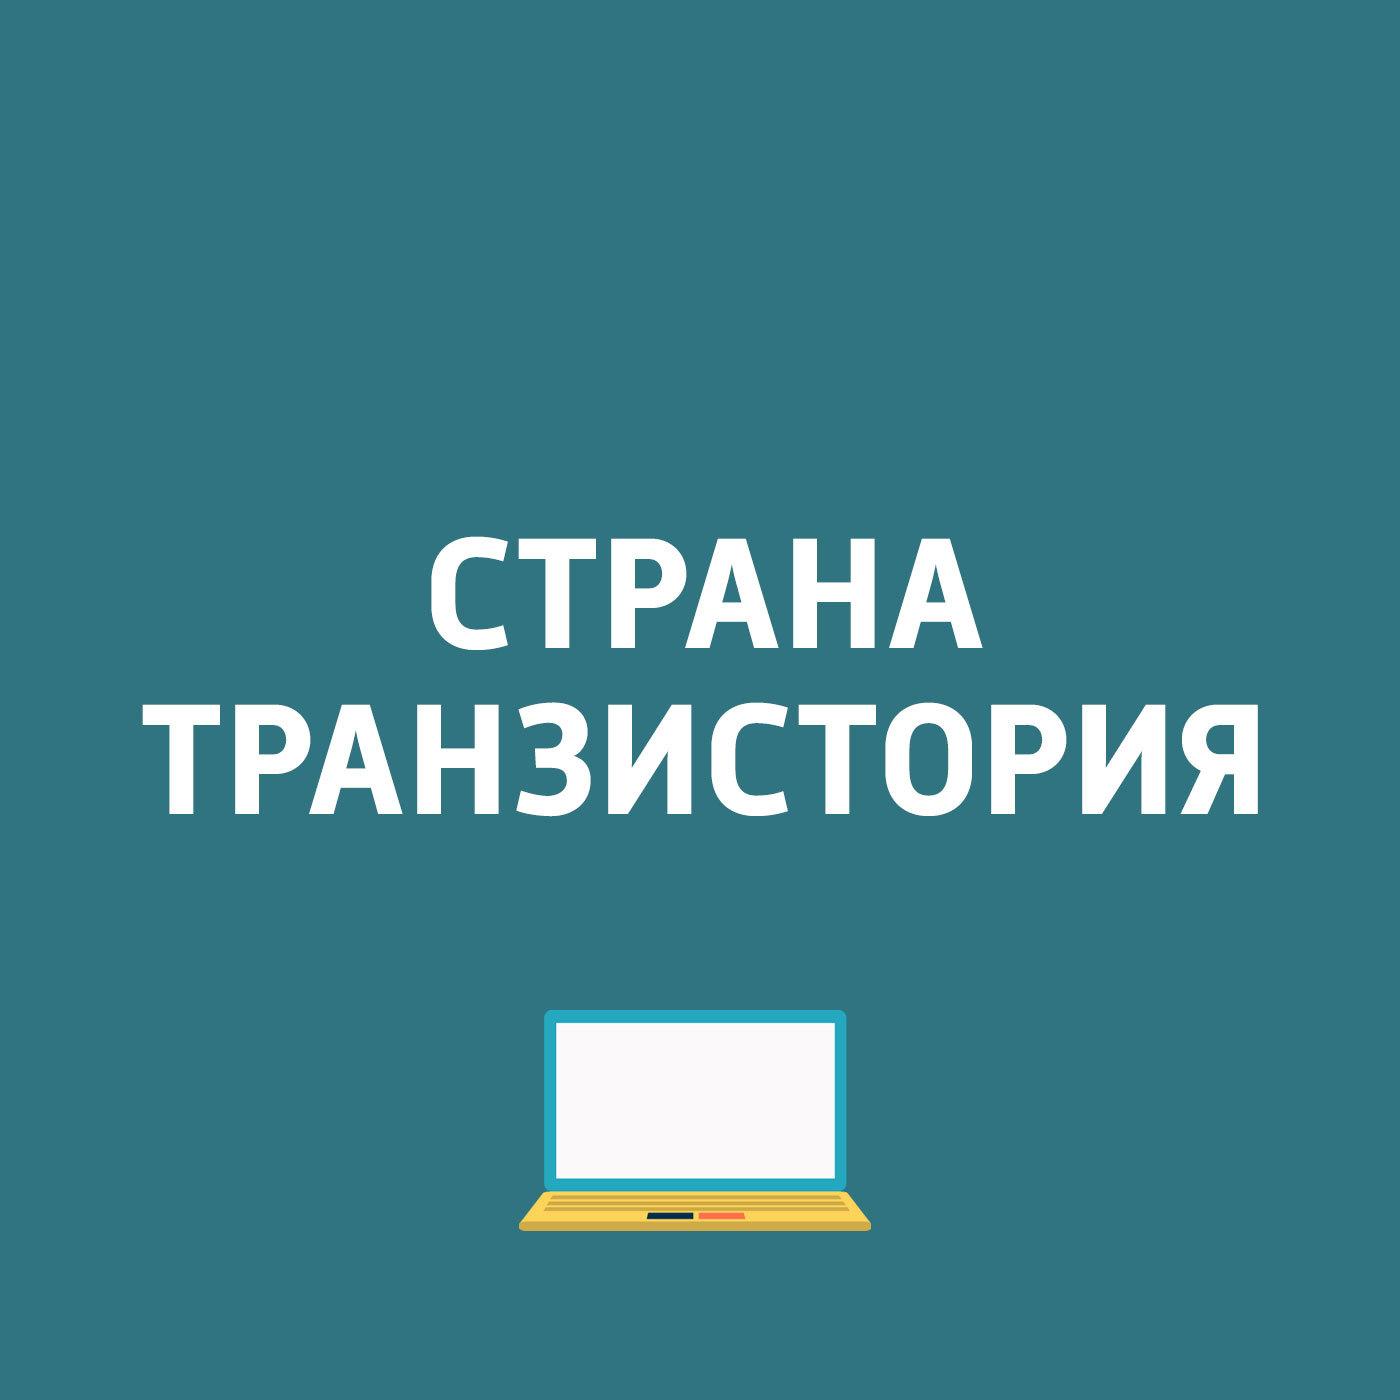 Бесплатный WhatsApp, блокировка rutracker, киберпонедельник